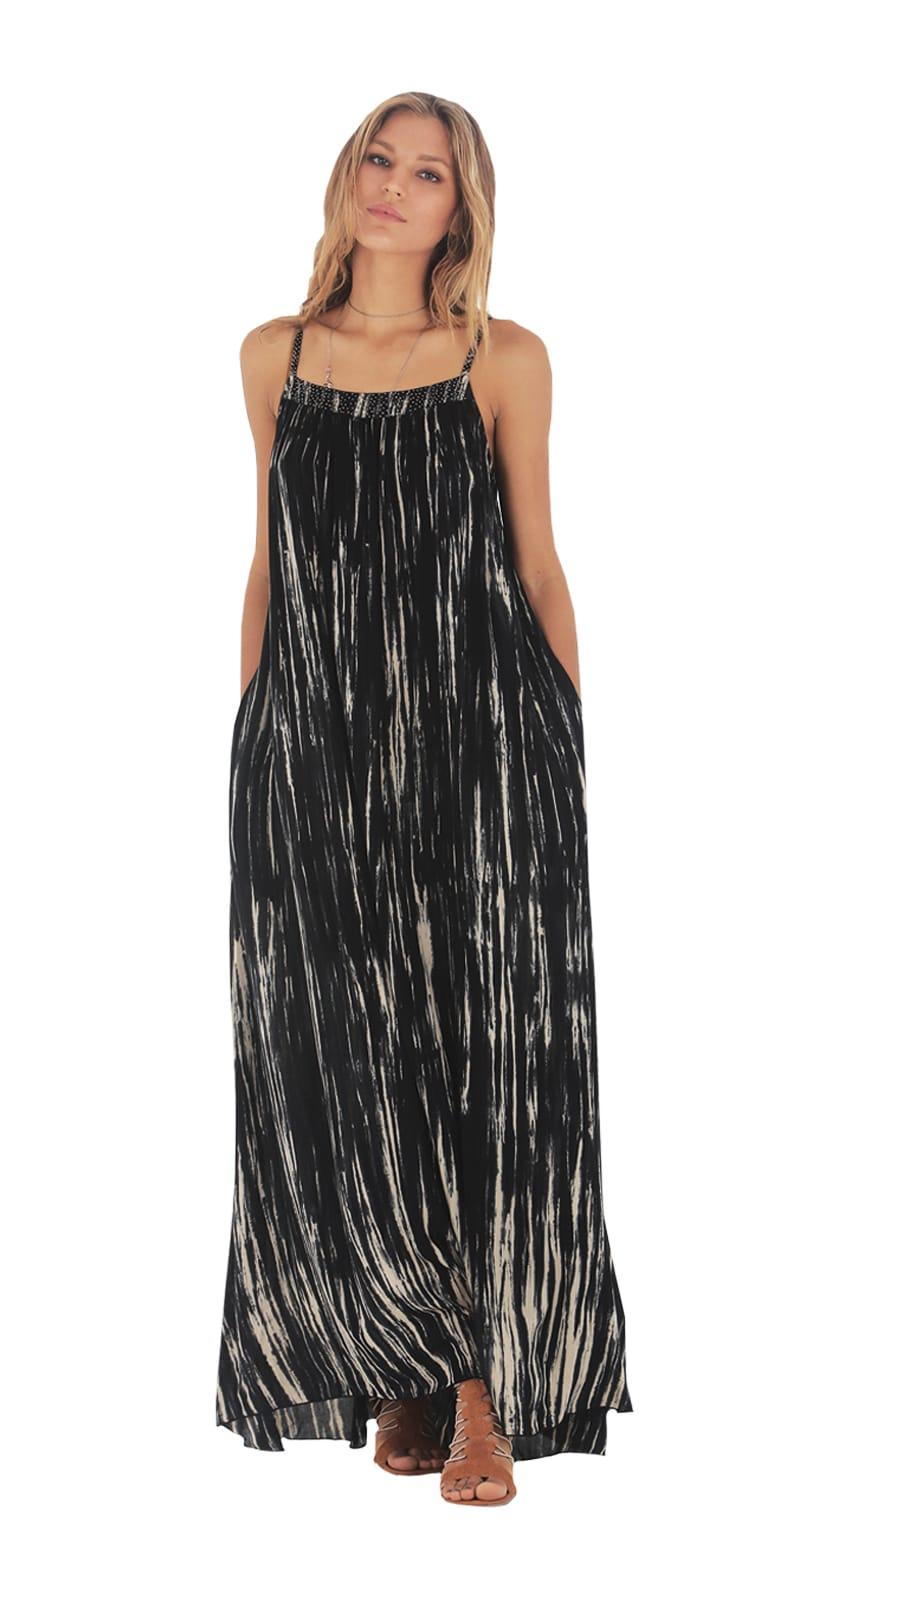 Riva Dress - Fog Black - Front